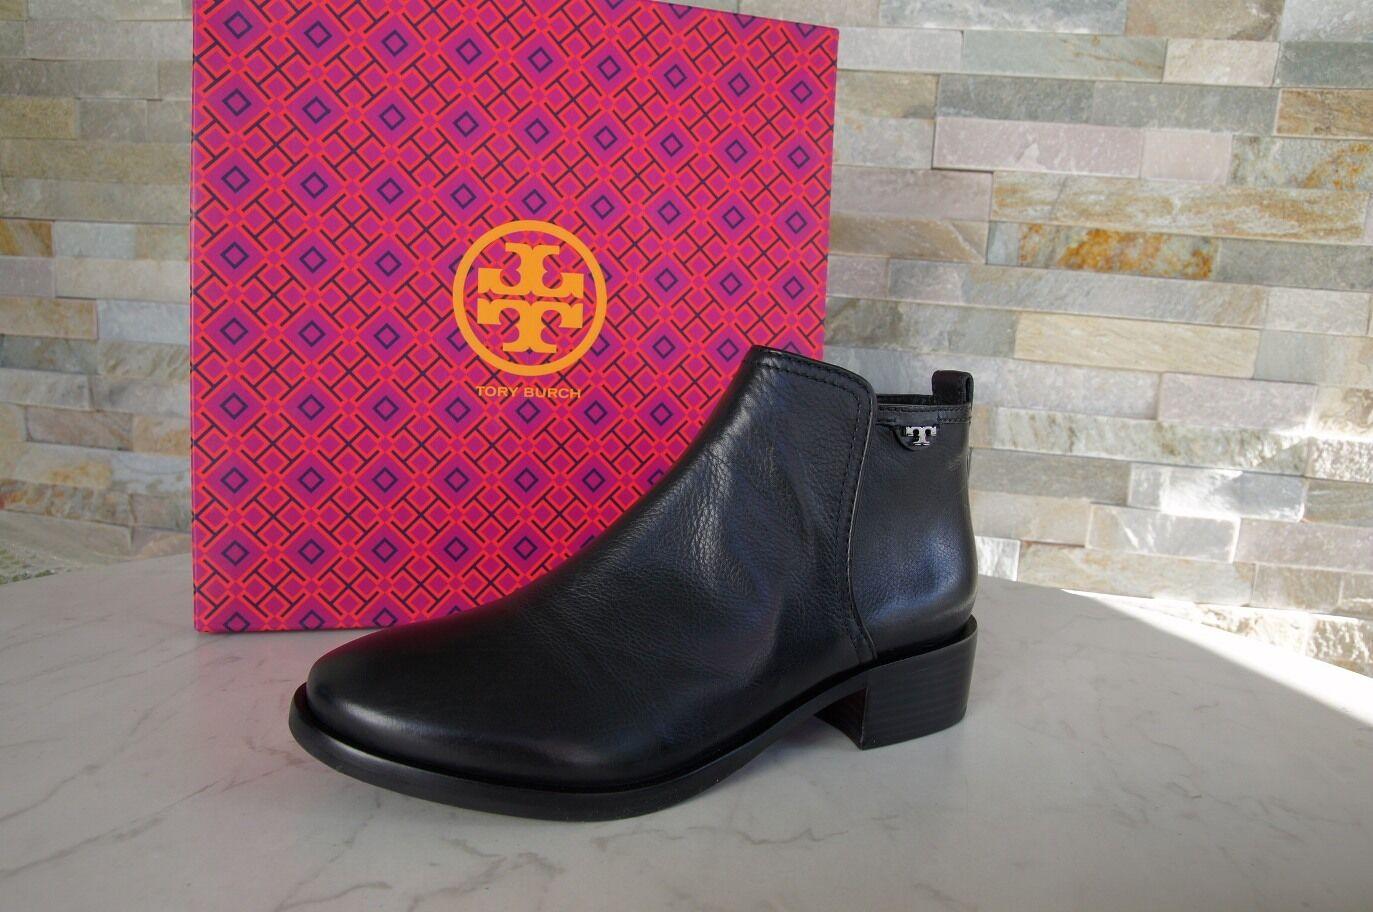 Tory Burch T 38,5 8,5 Bottines Chaussures 31148341 Noir Neuf Ex Prix Recommandé